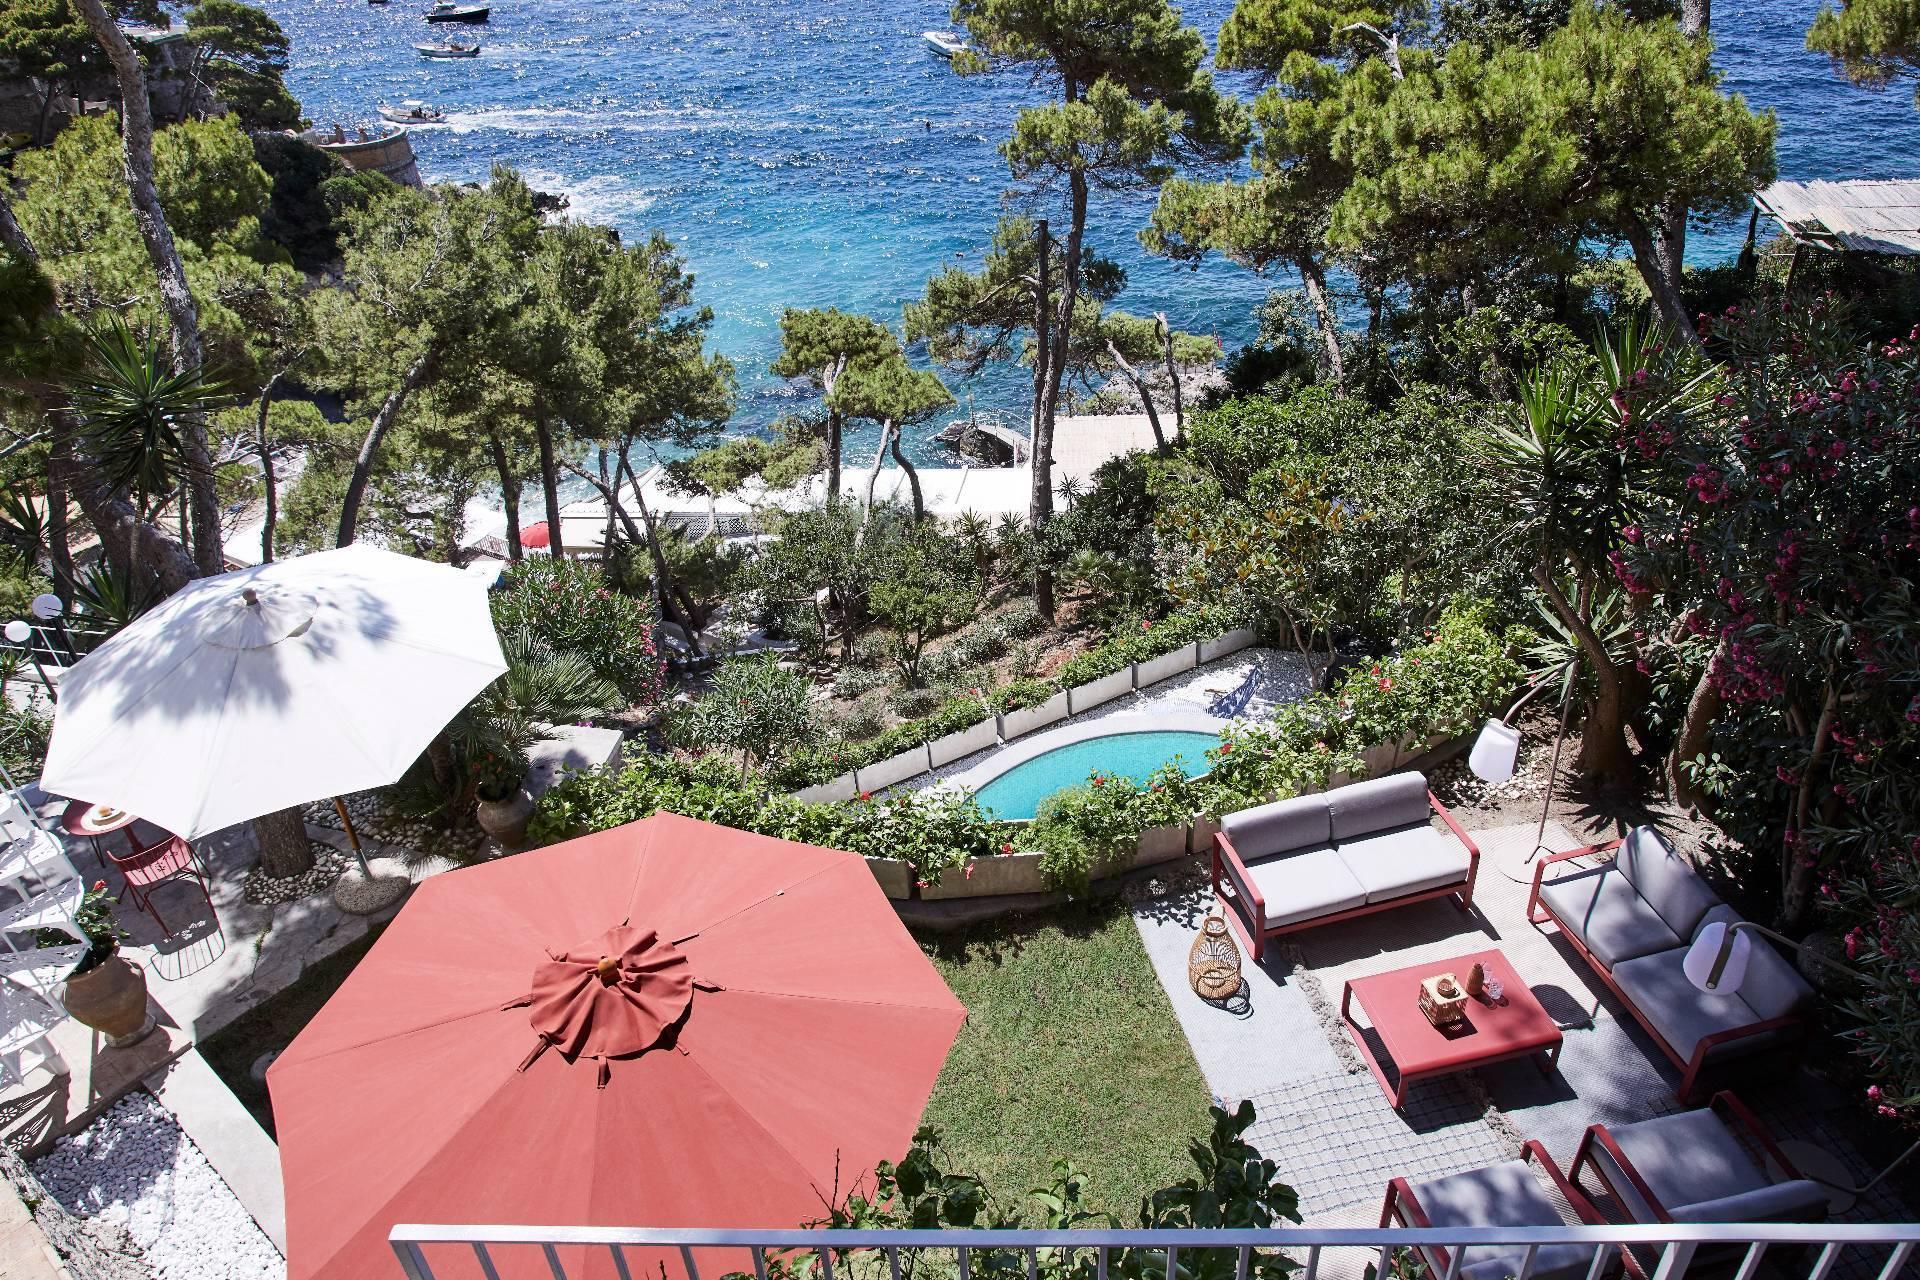 Villa Pieds dans l'eau in Capri - 2